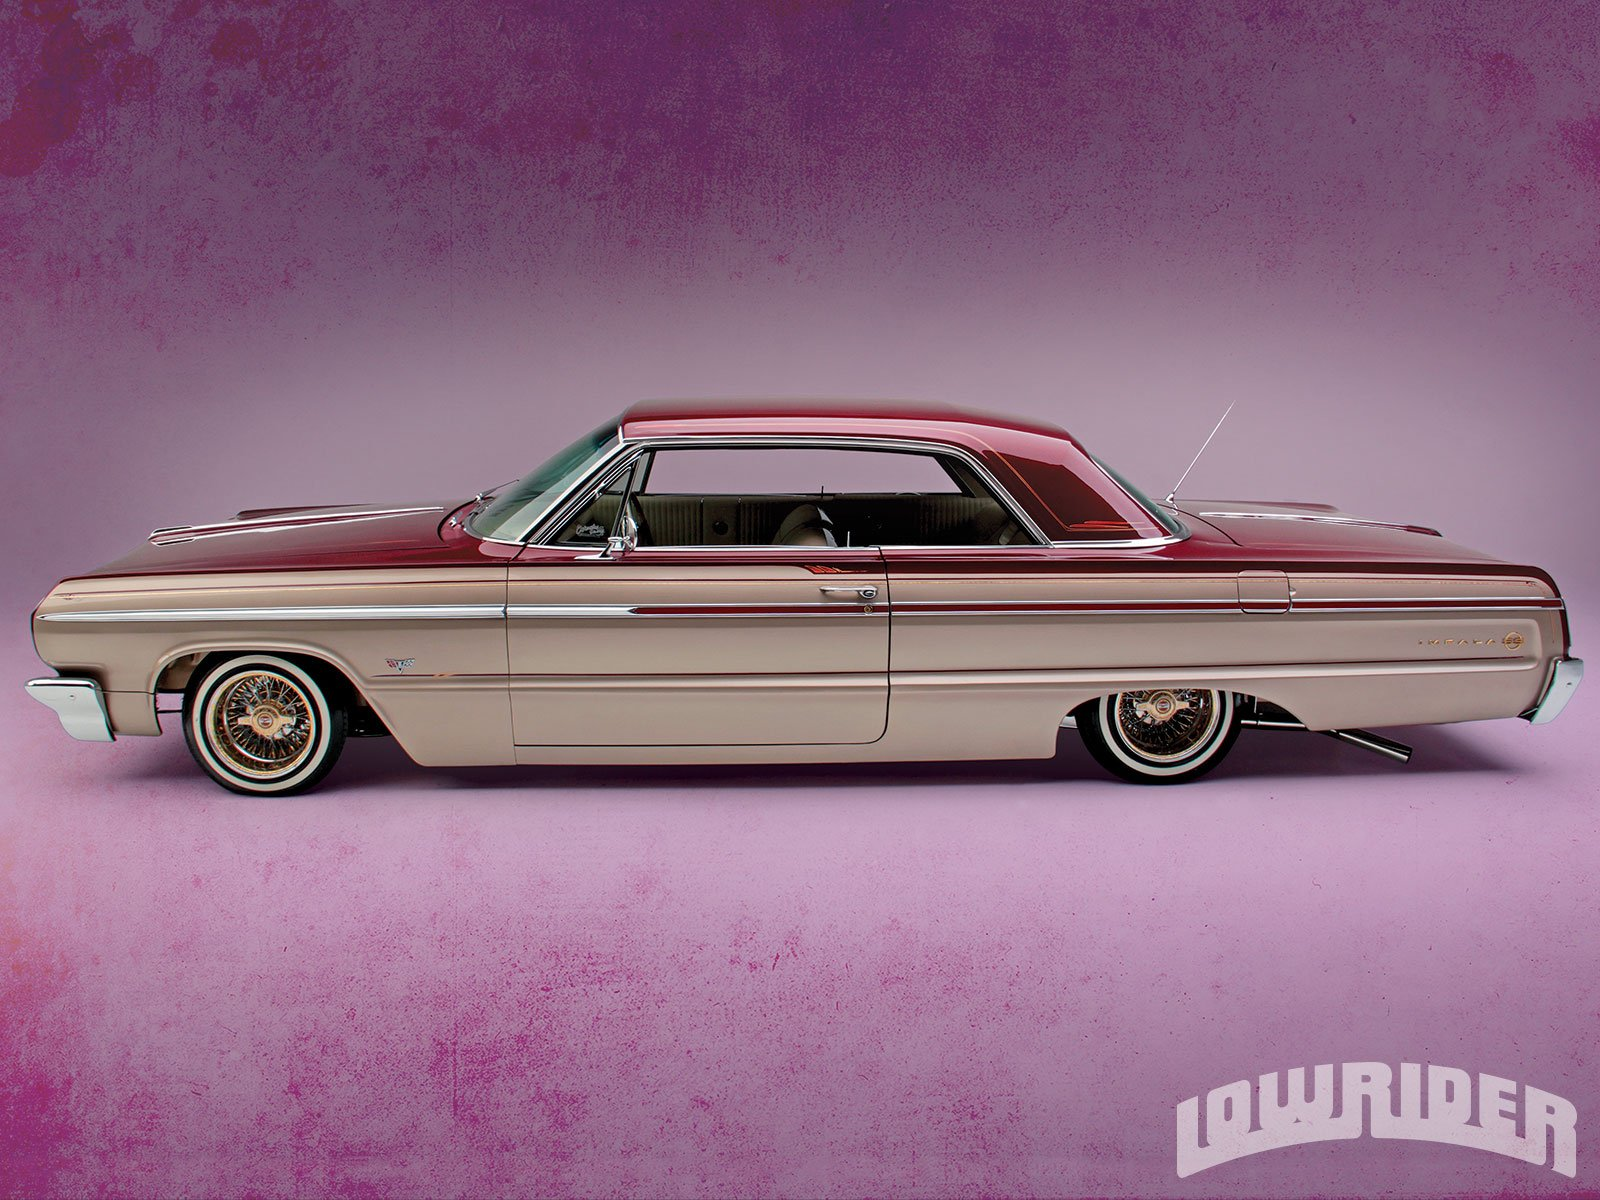 1964 Chevrolet Chevy Impala Custom Lowrider Usa 1600x1200